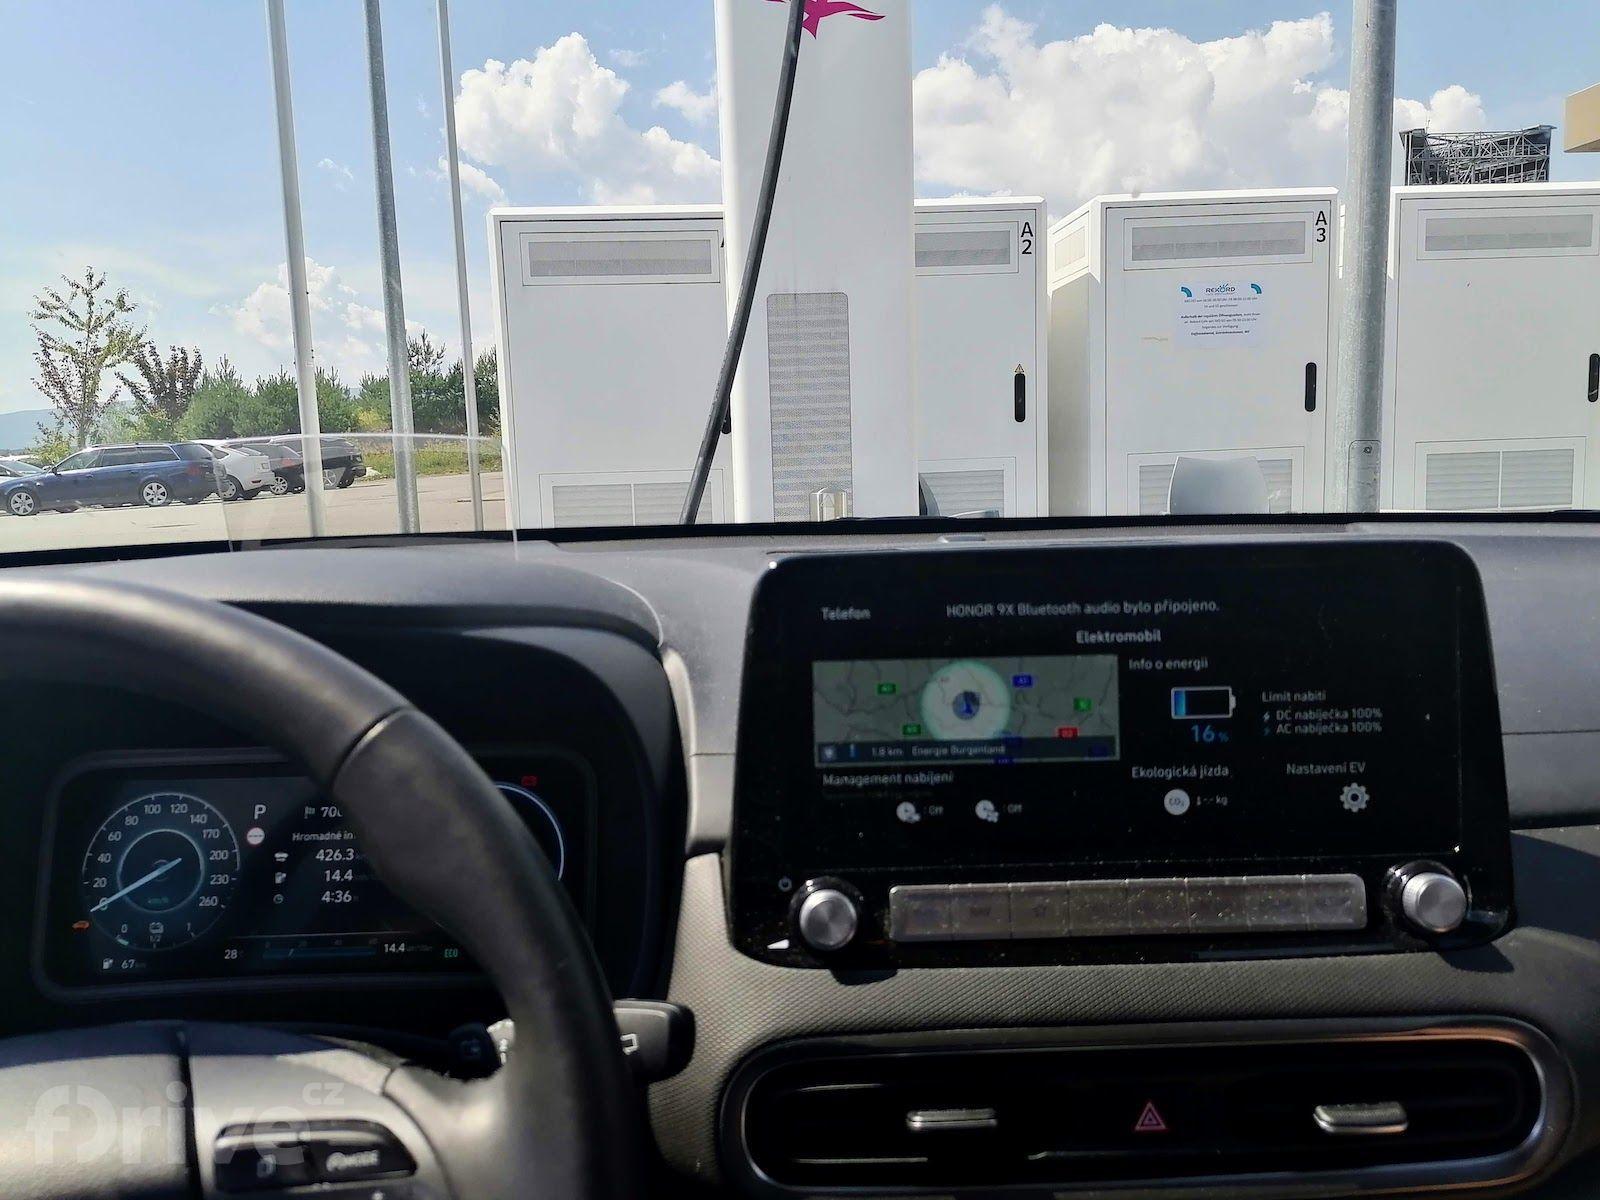 Cesta do Chorvatska - Hyundai Kona